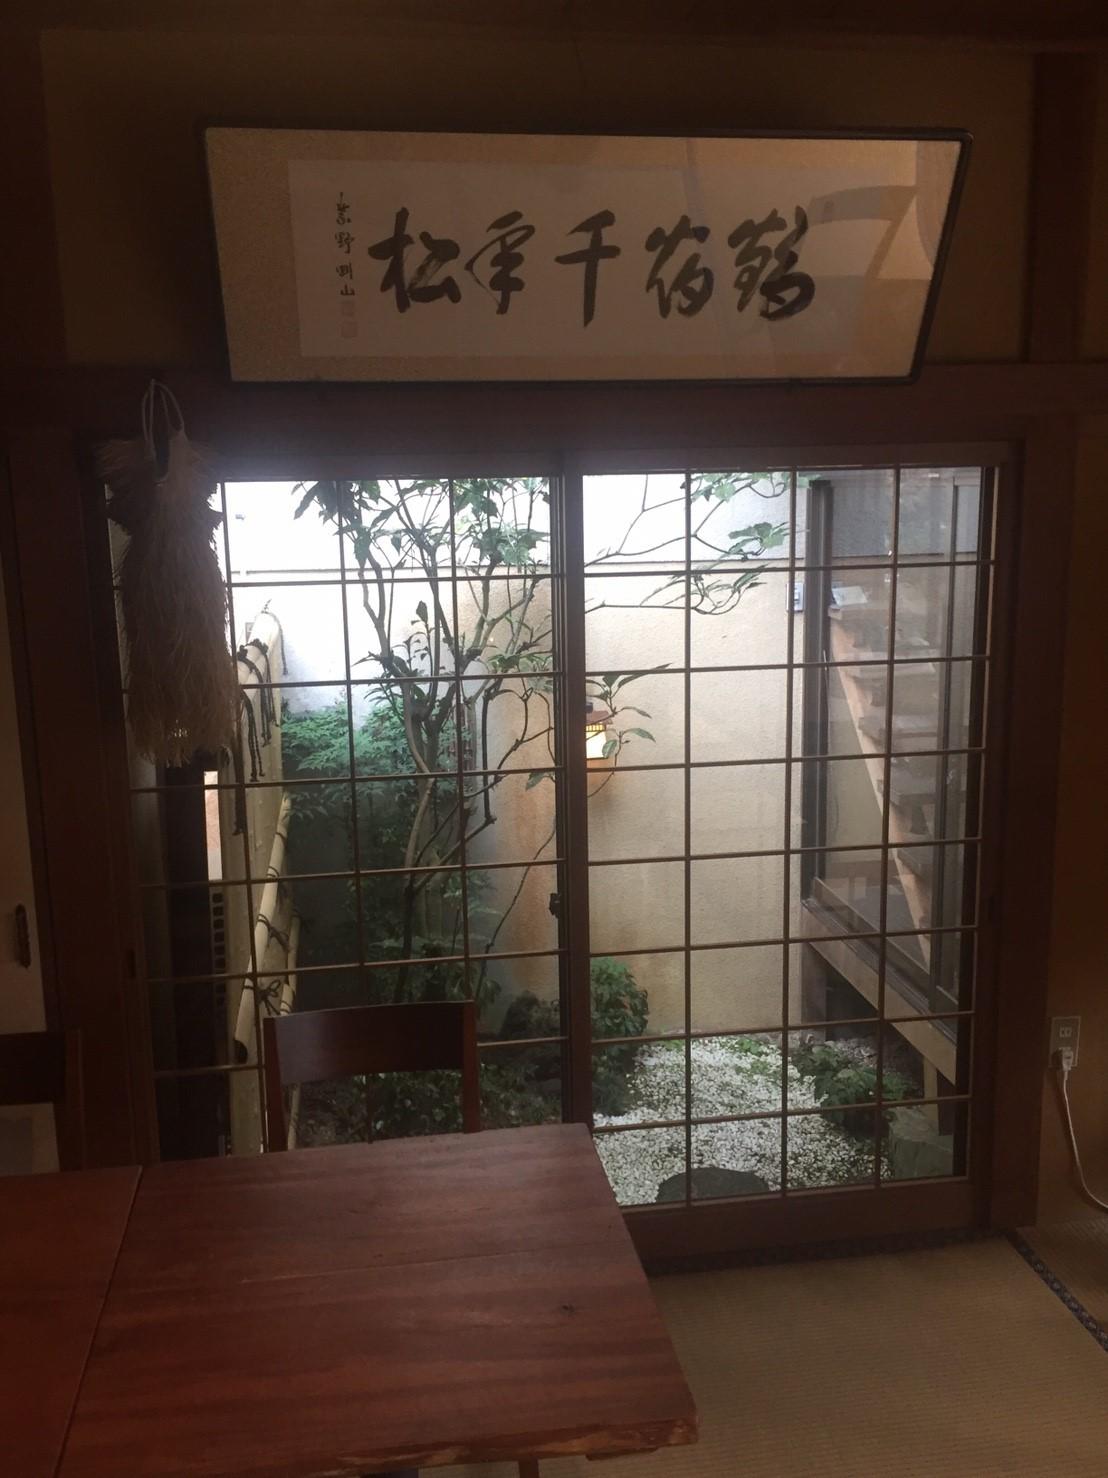 kitchin & cafe 葵屋_e0115904_04295849.jpg